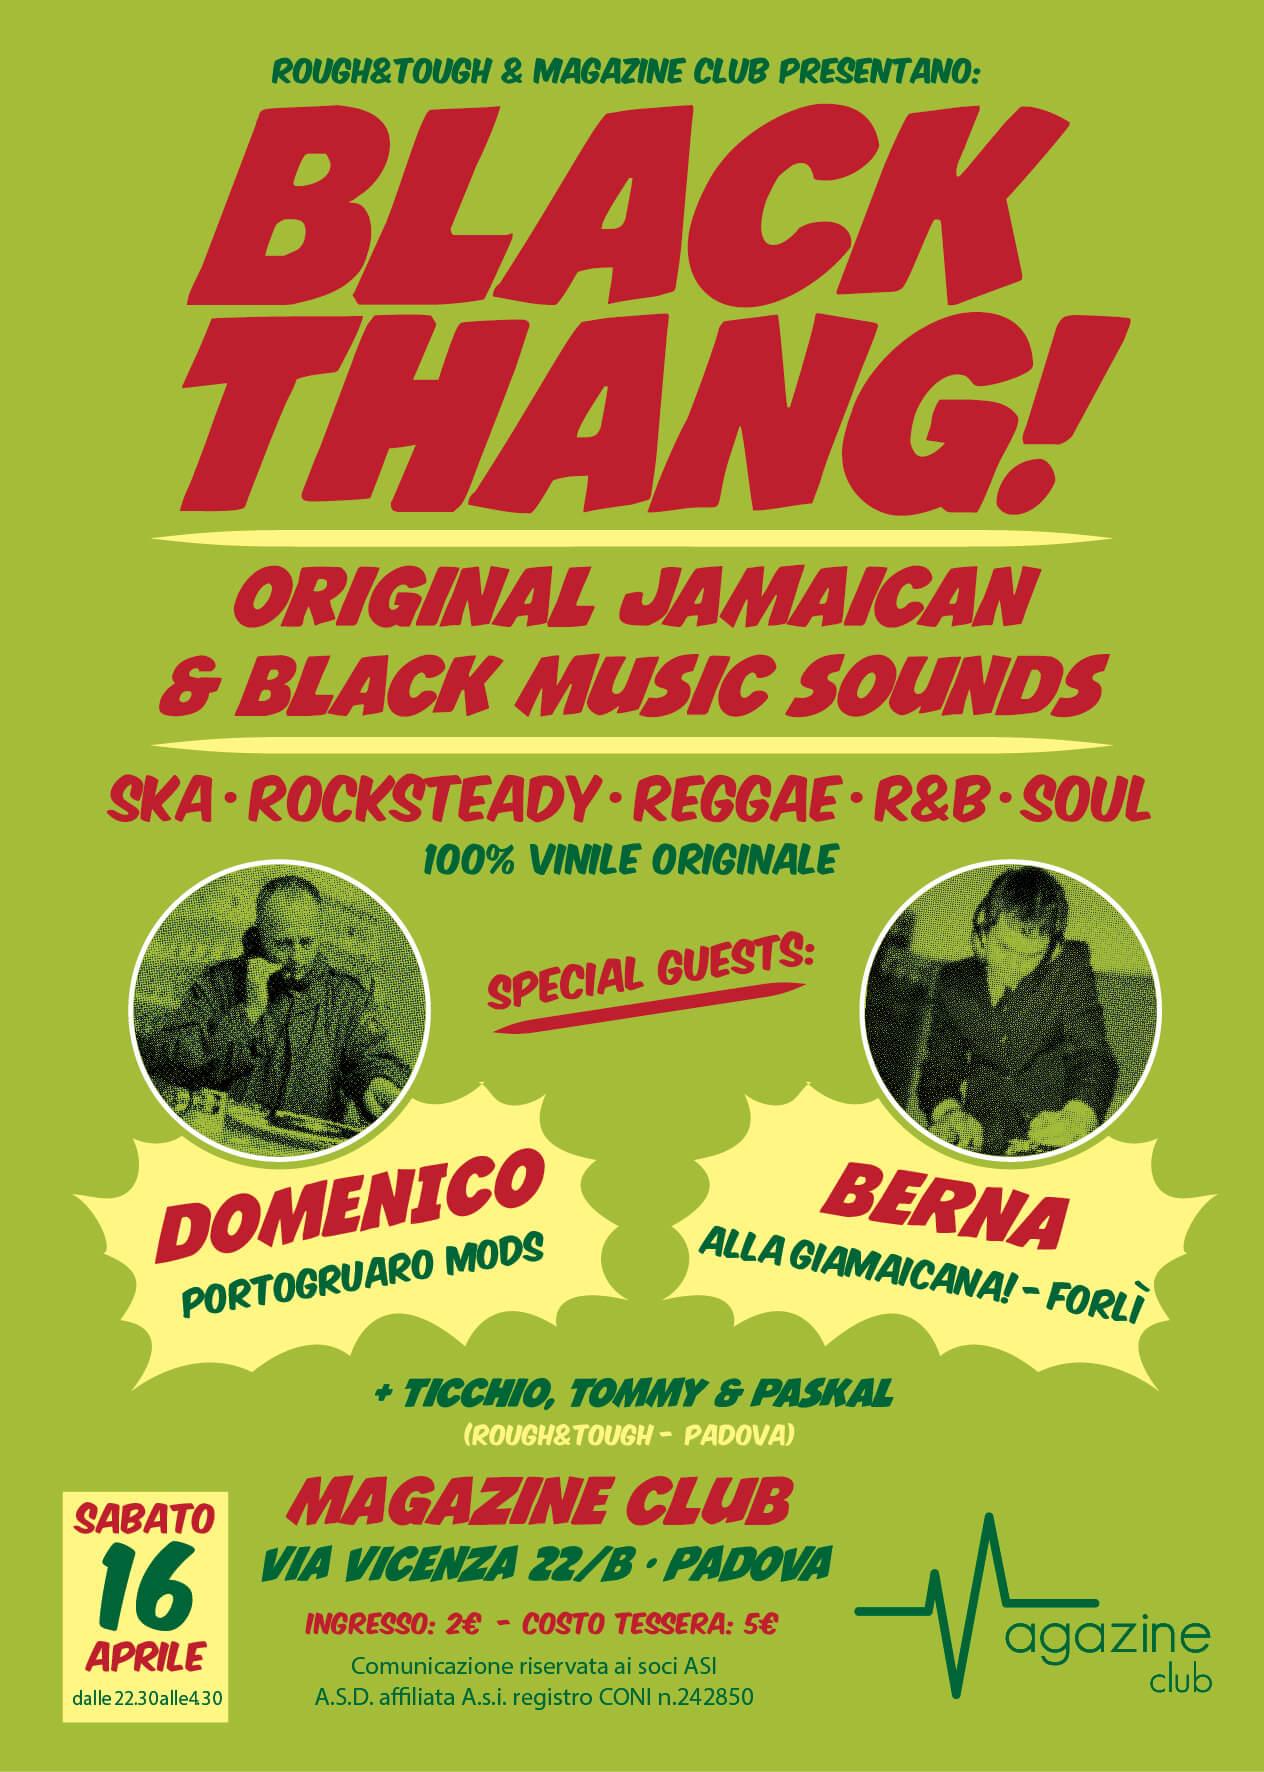 black thang, serata ska reggae soul r&b, 16 aprile a Padova